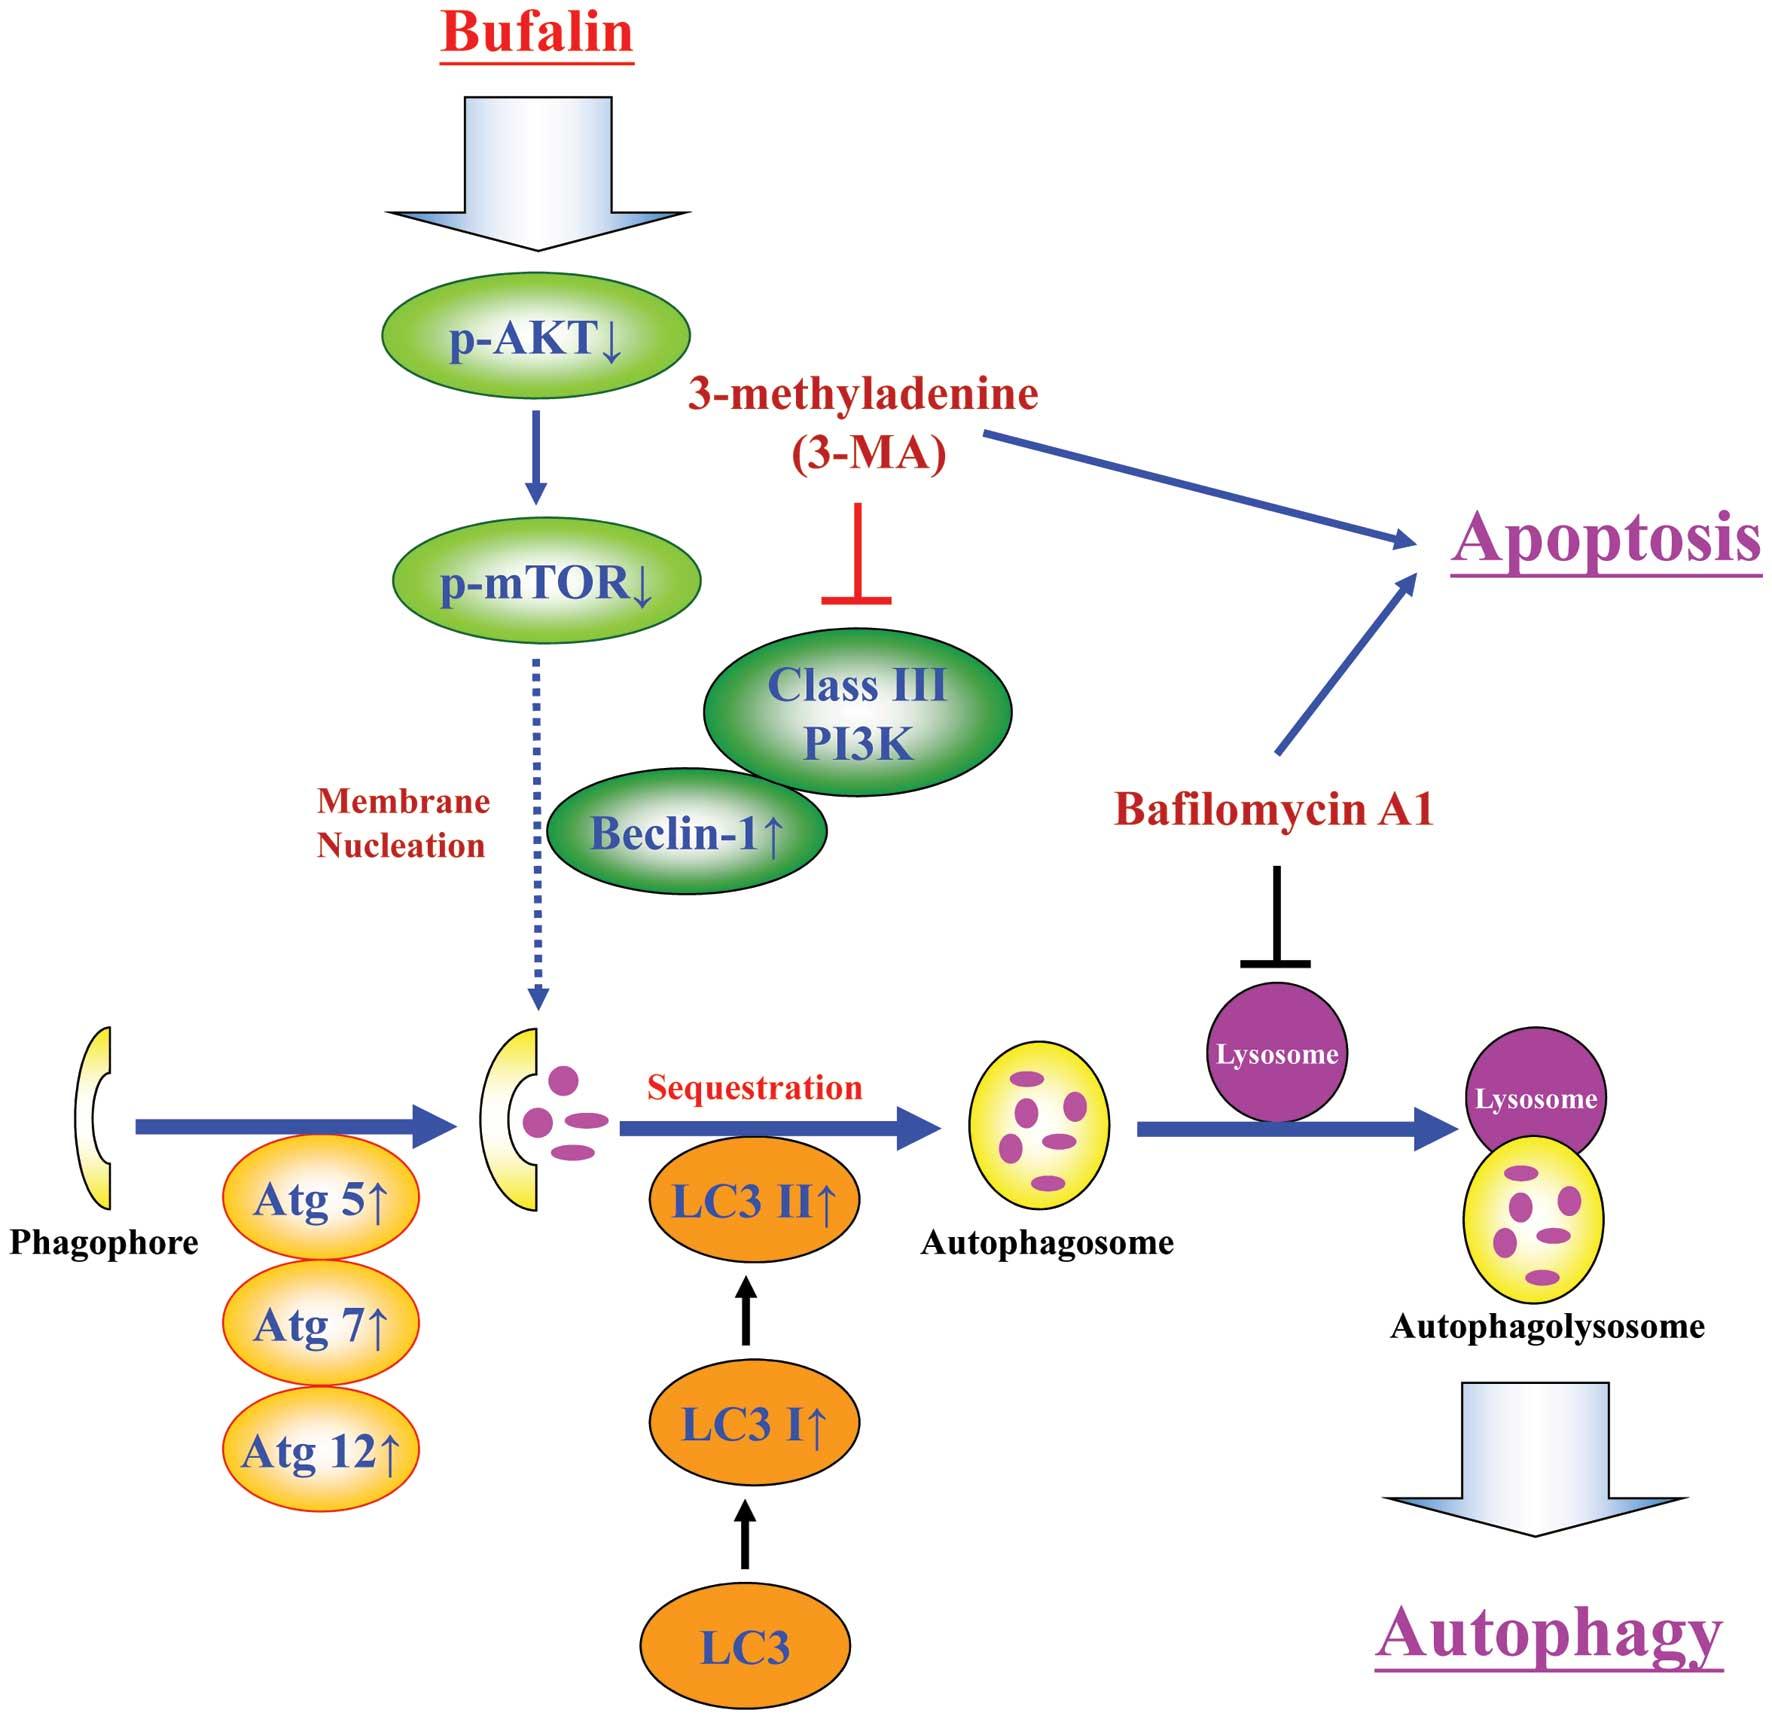 P38 and JNK MAPK pathways control the balance of apoptosis ...